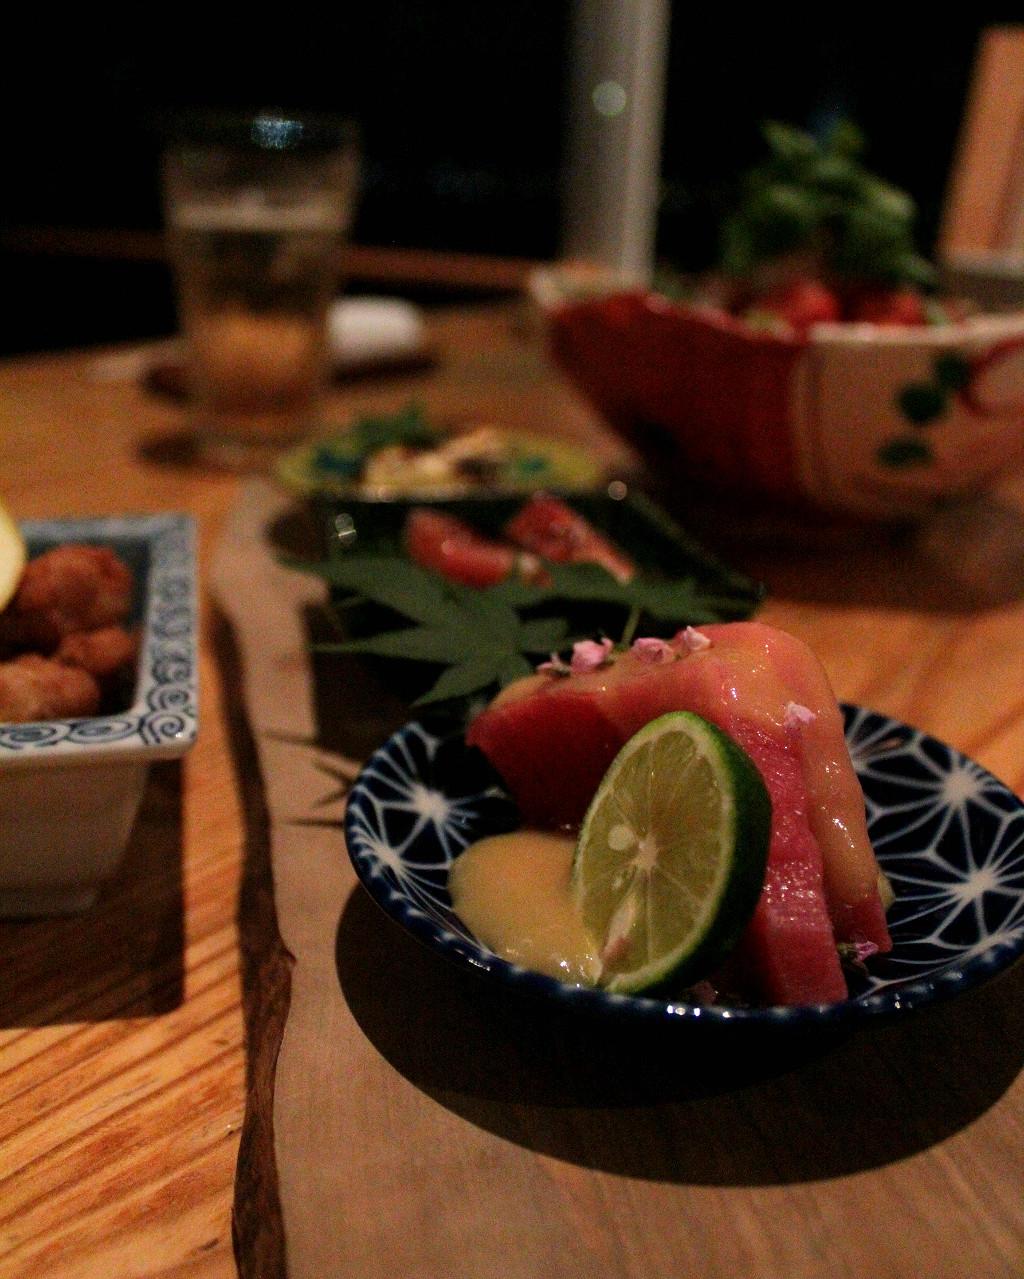 Plum Dining omakase chef's choice set, in Uchinada, Japan